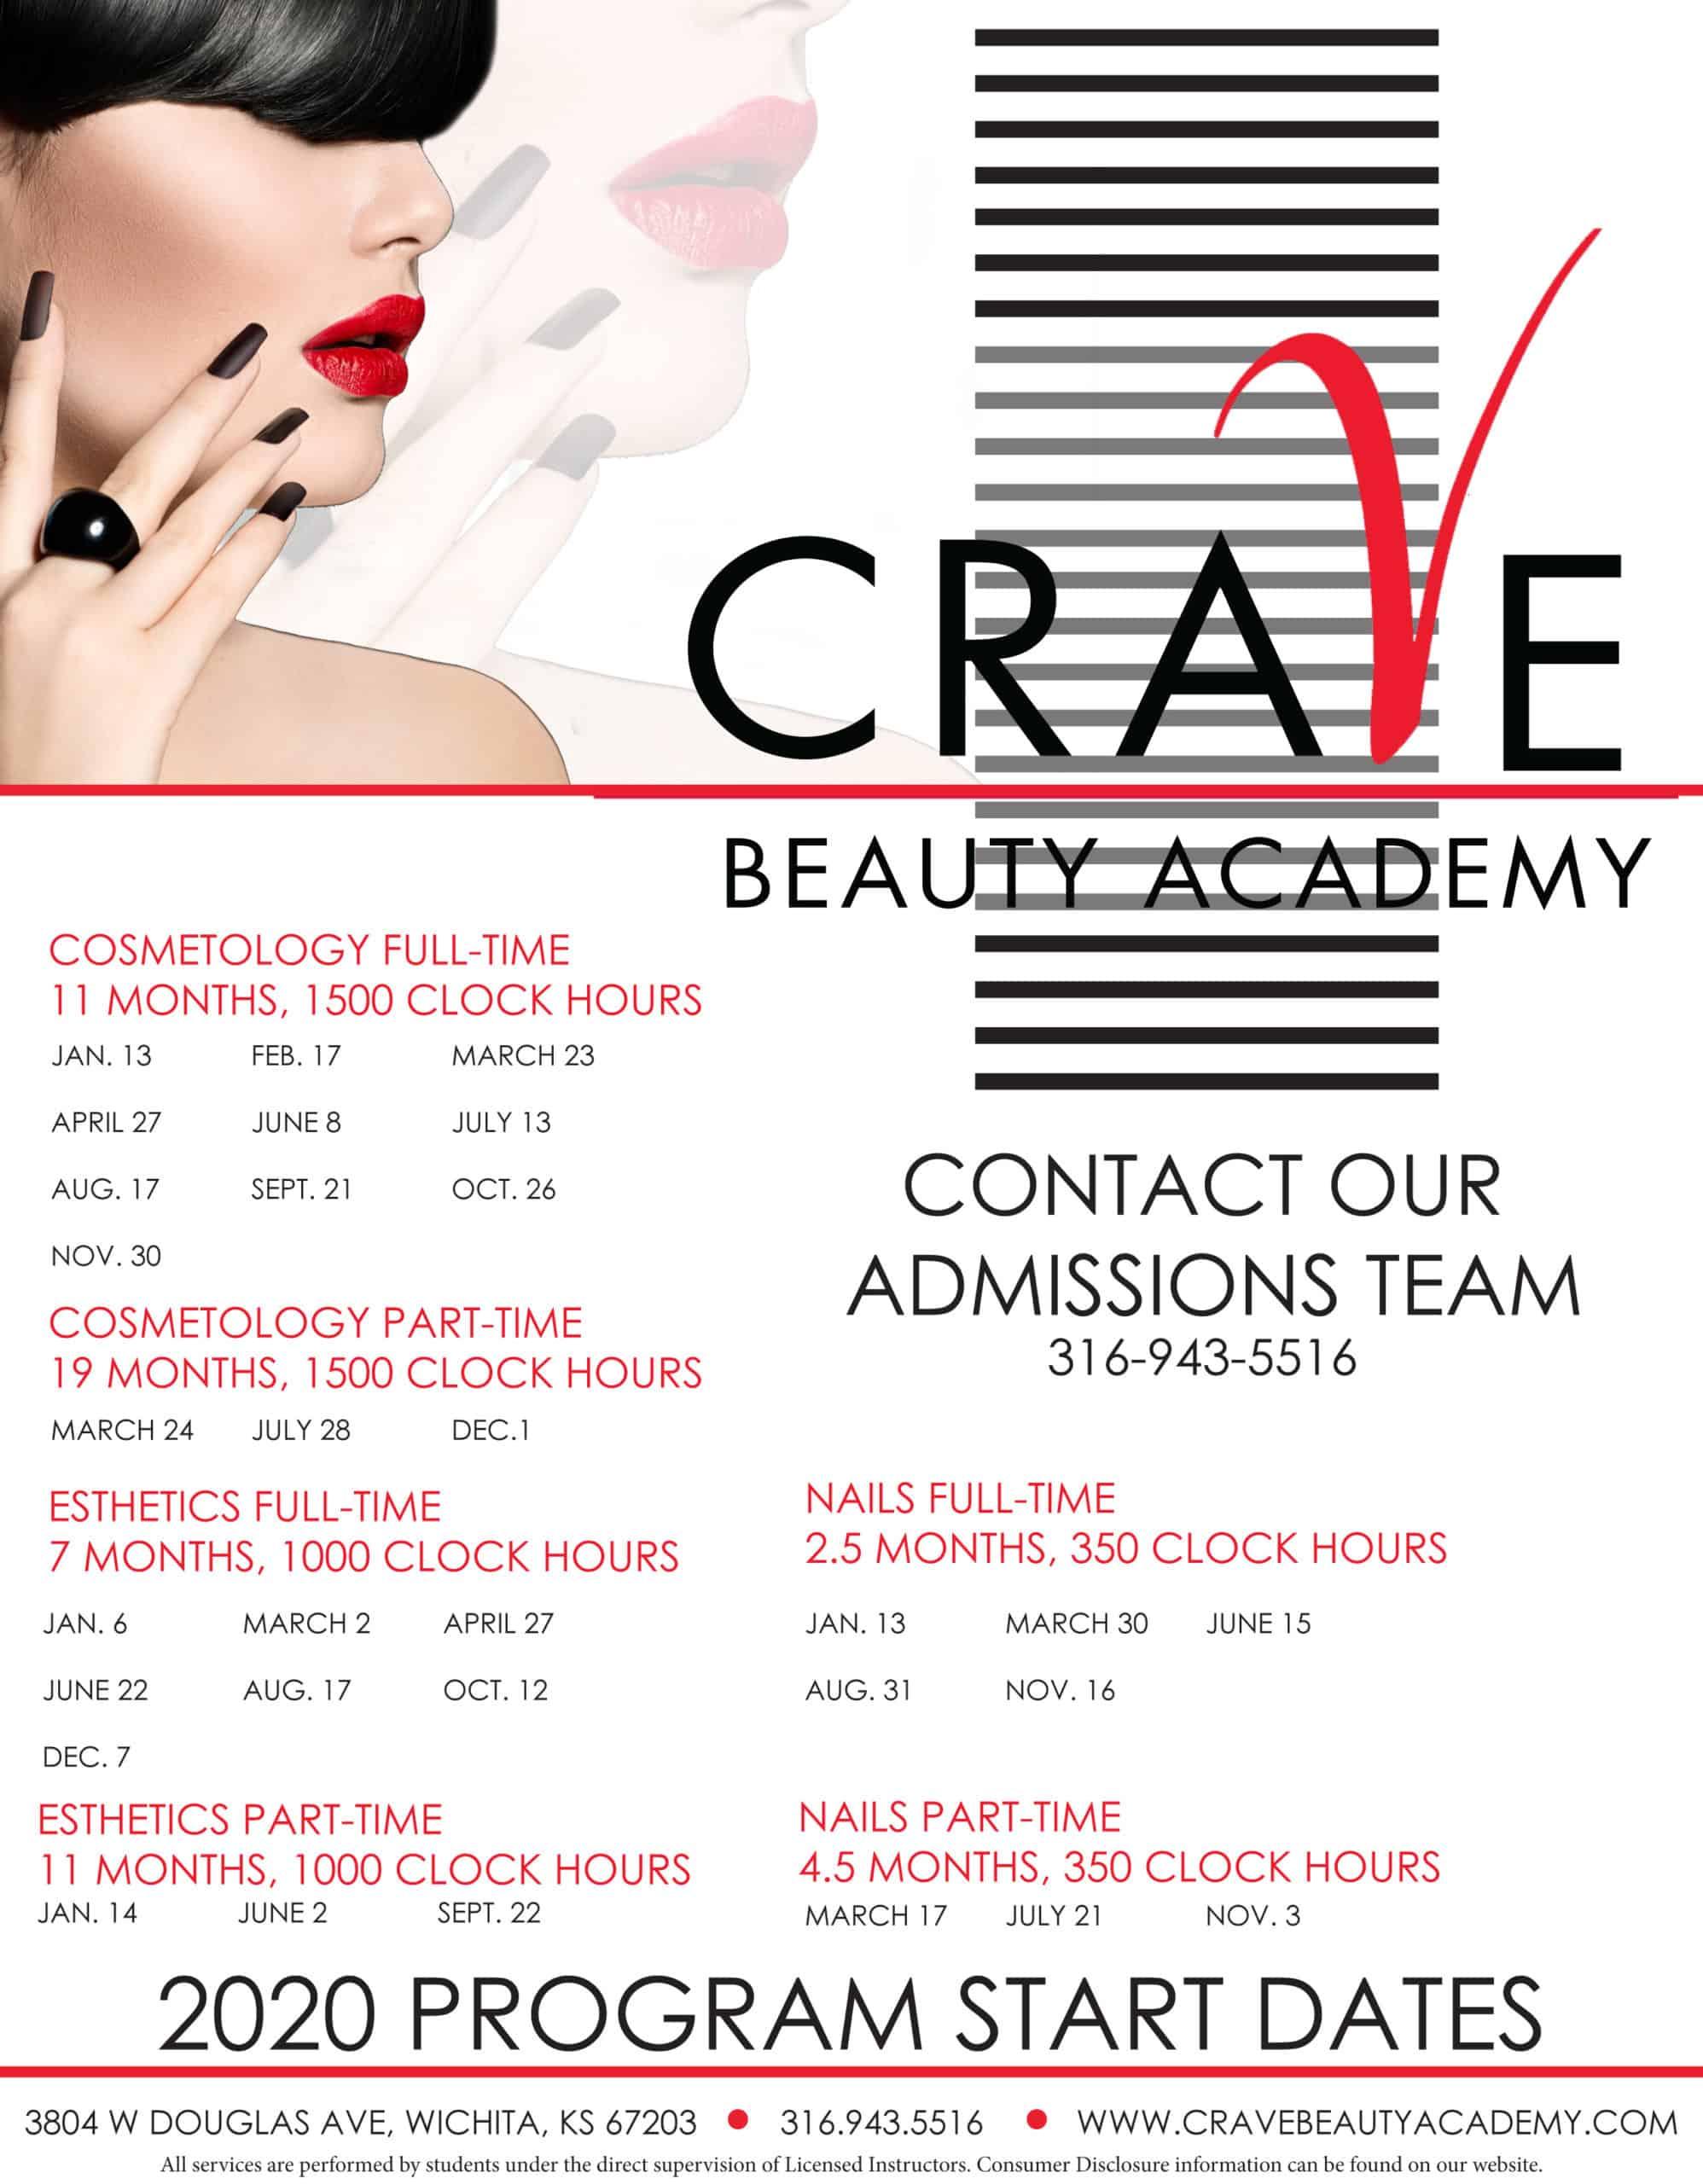 crave beauty academy display ad wichita ks